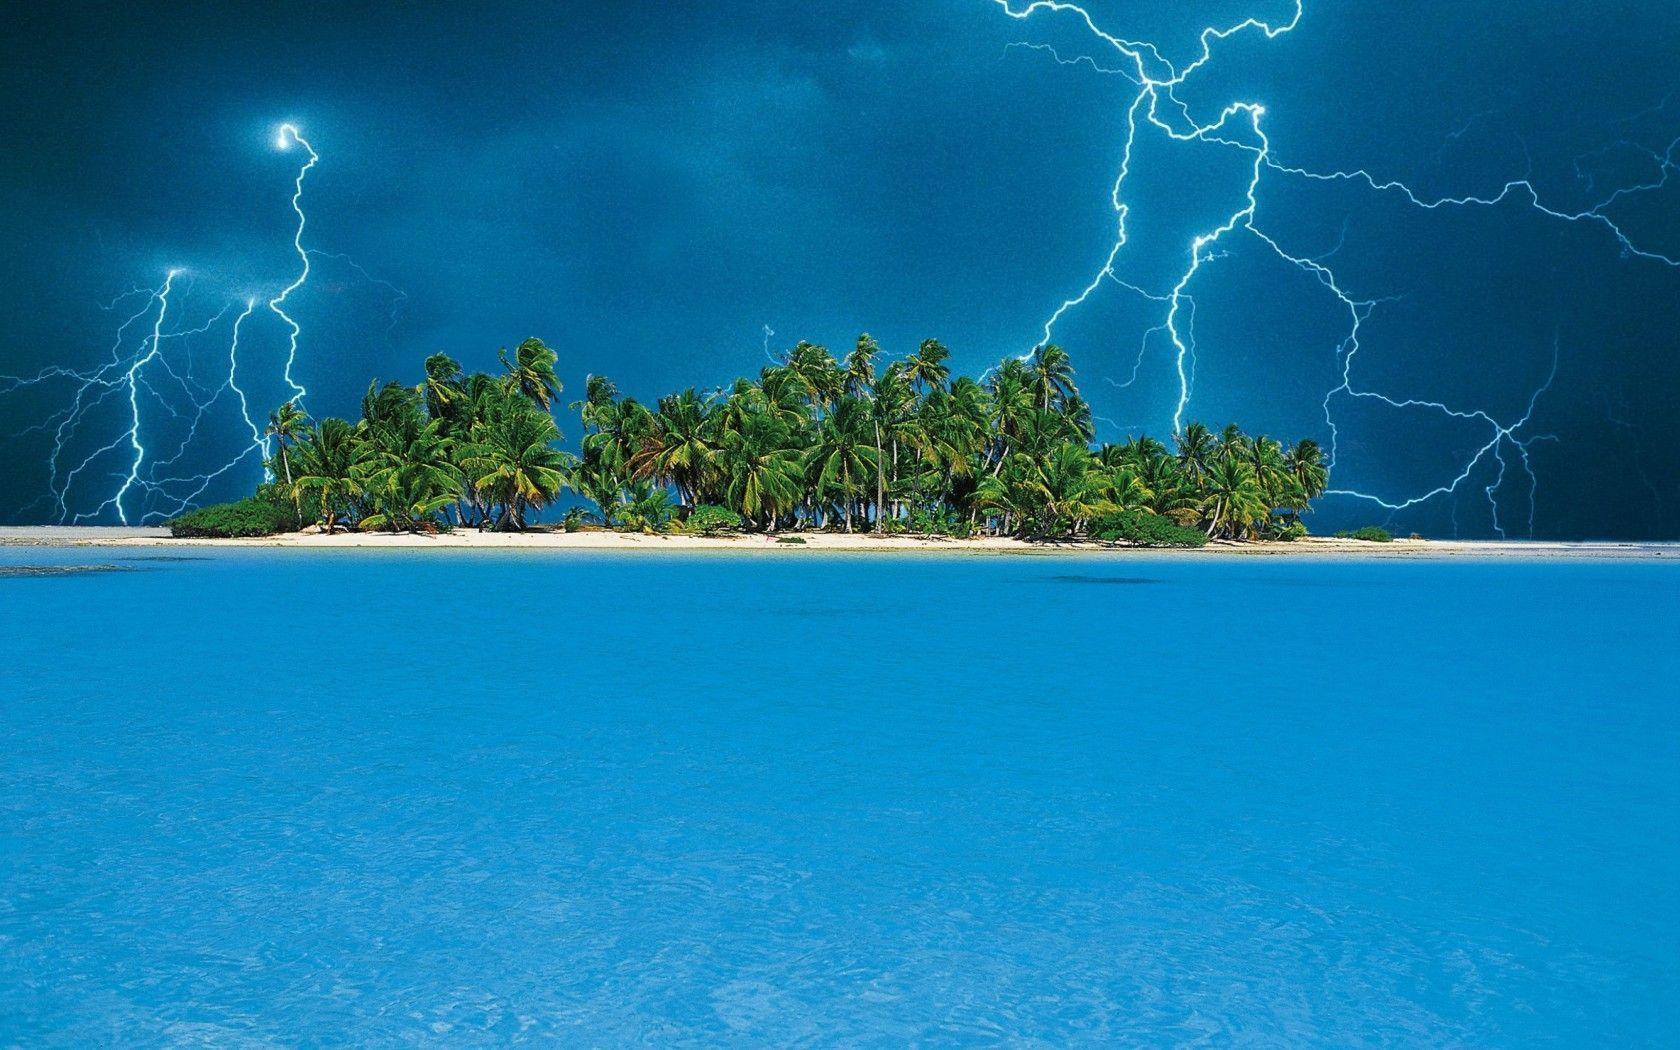 Hd Tropical Island Beach Paradise Wallpapers And Backgrounds: Tropical Island Wallpapers